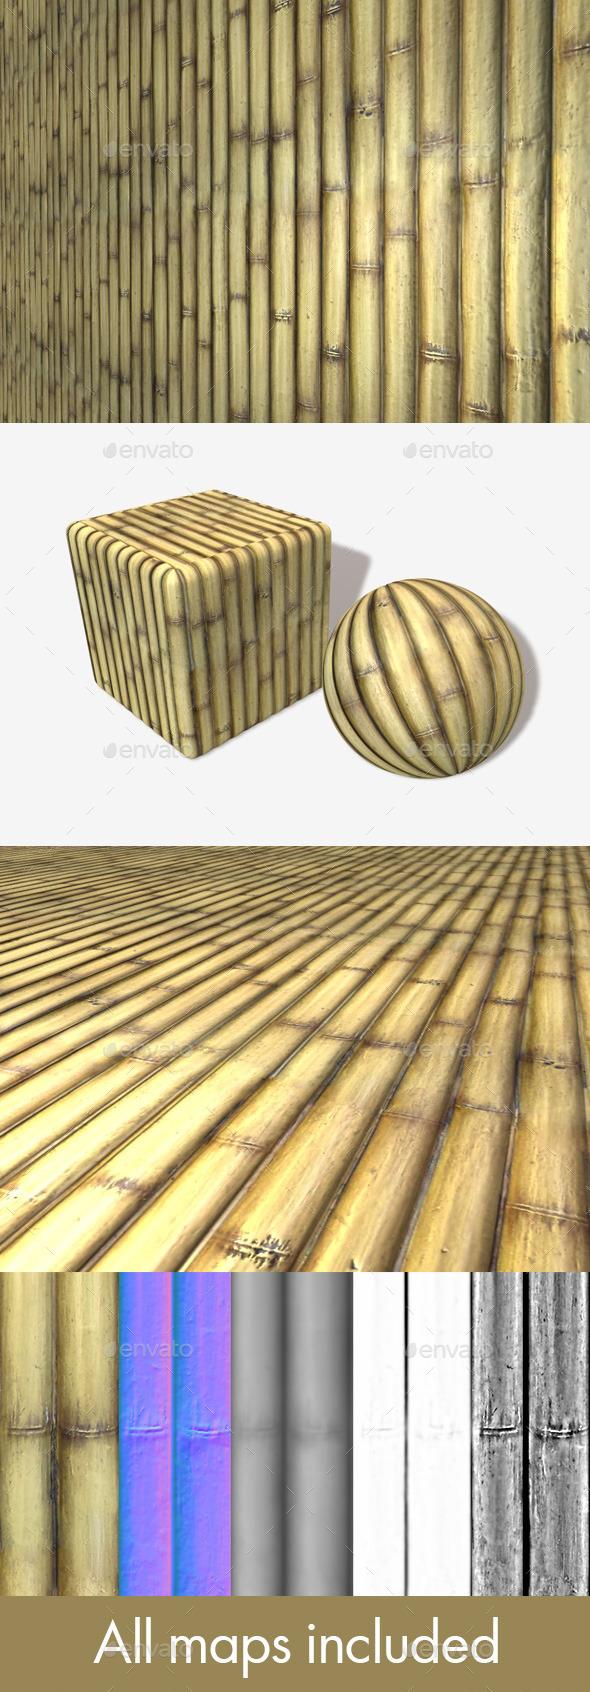 3DOcean Bamboo Seamless Texture 11212323